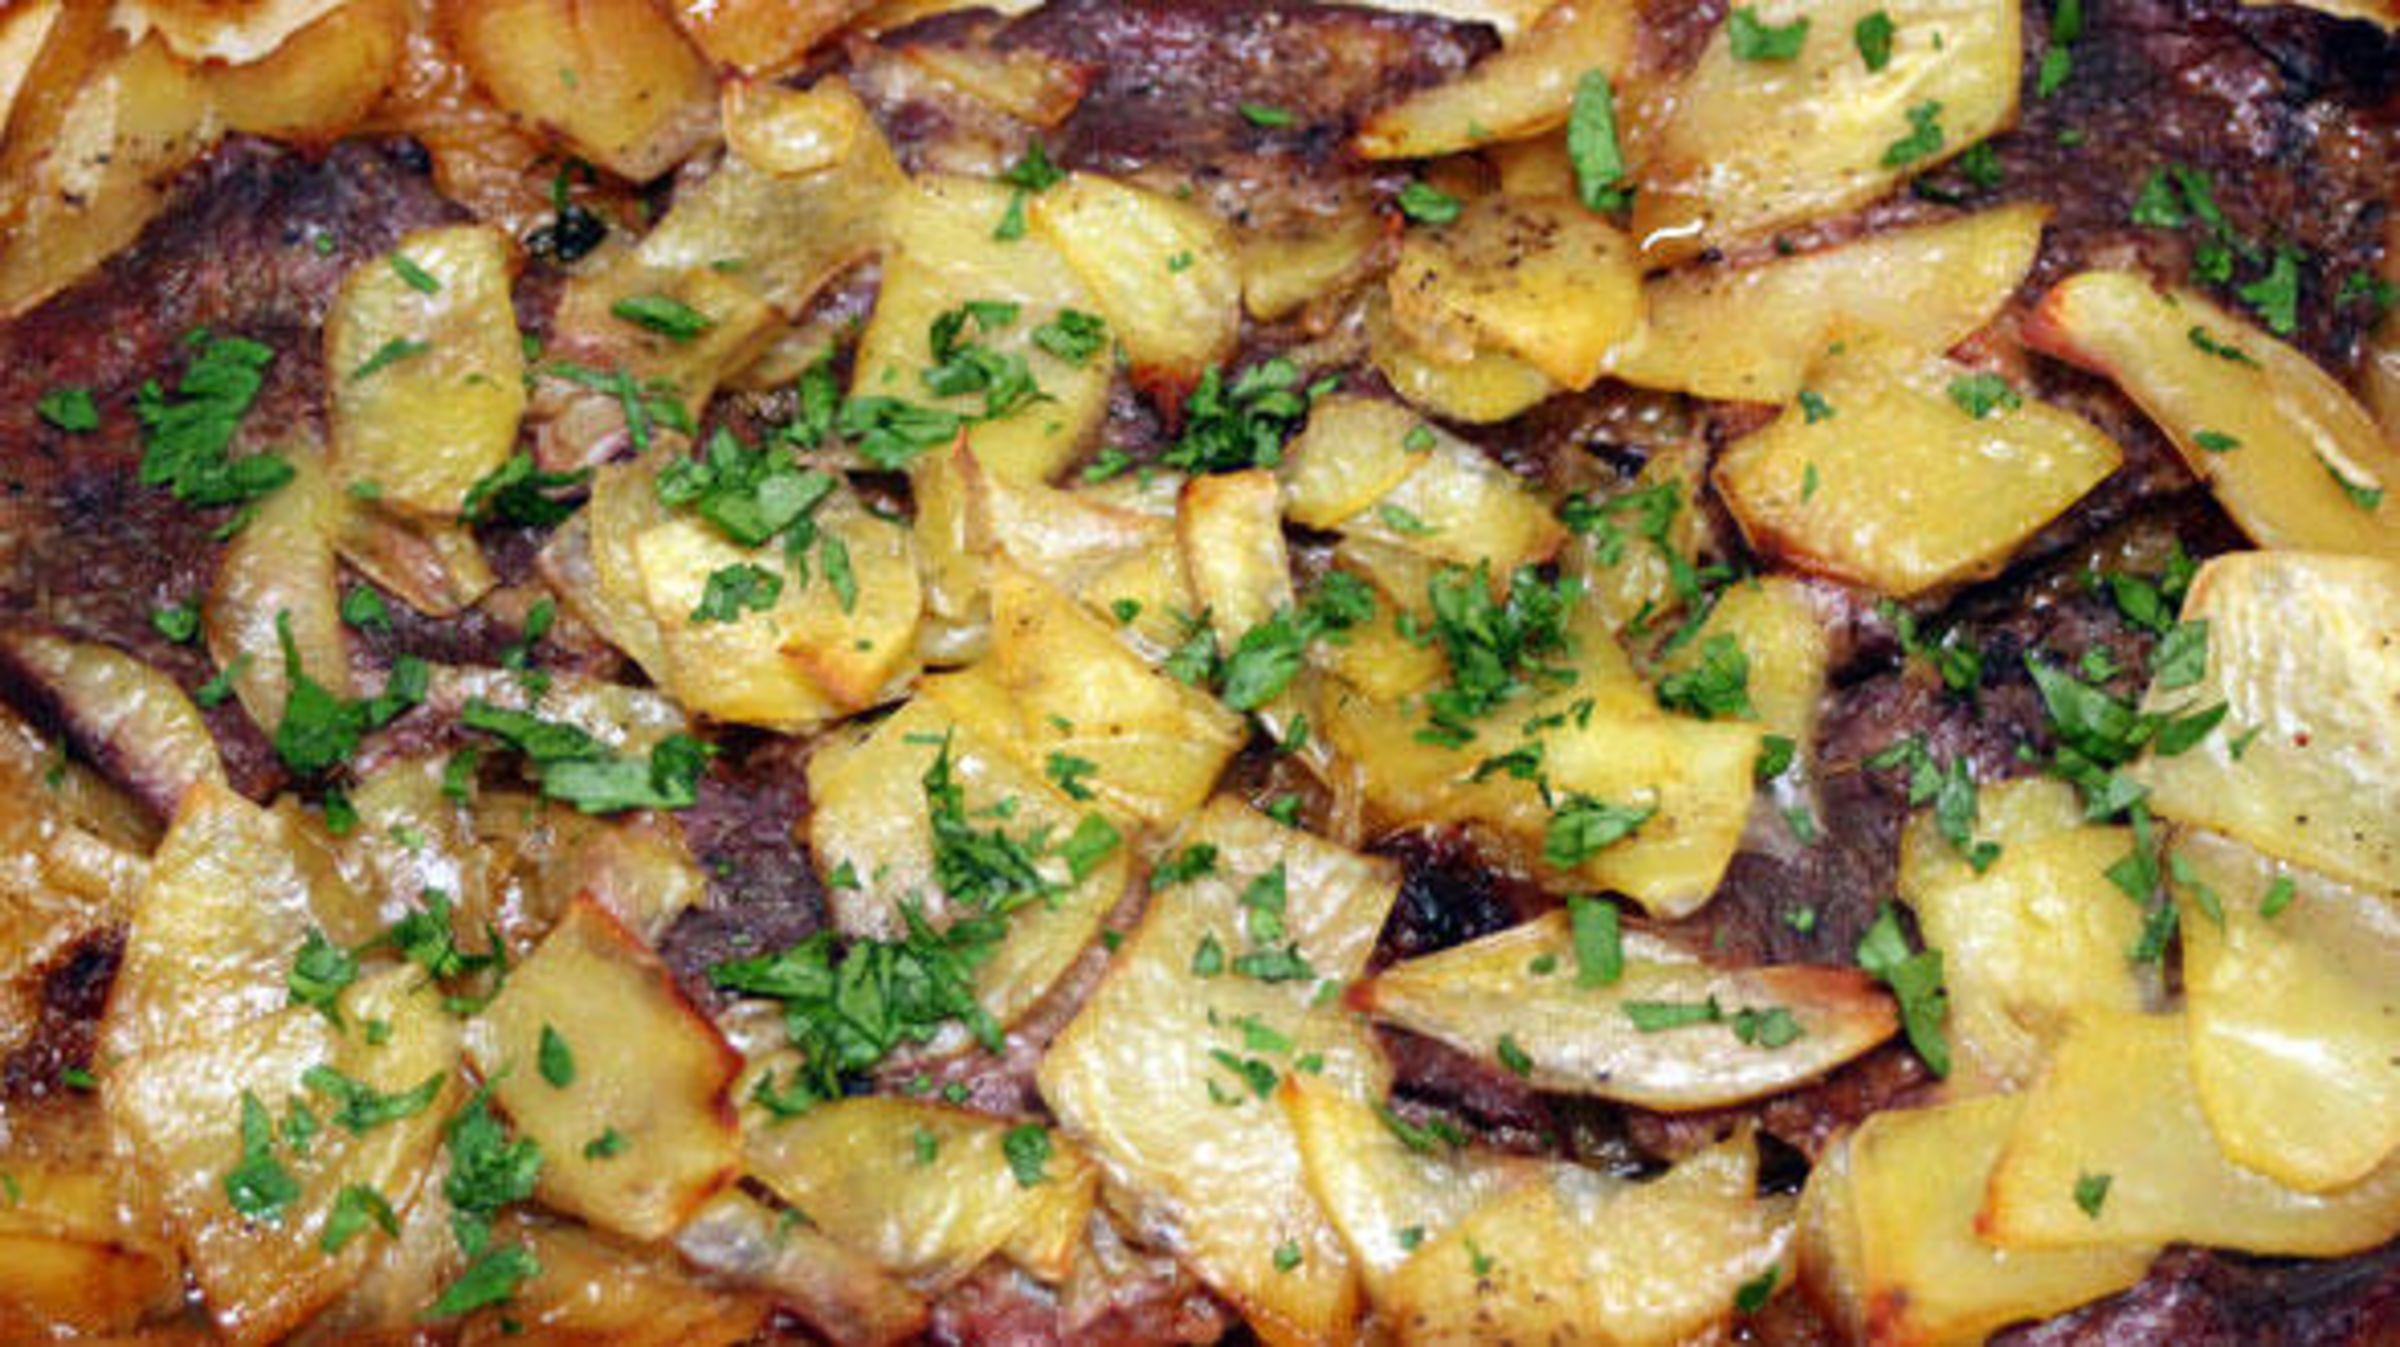 Swedish Sailor's Beef and Potato Casserole